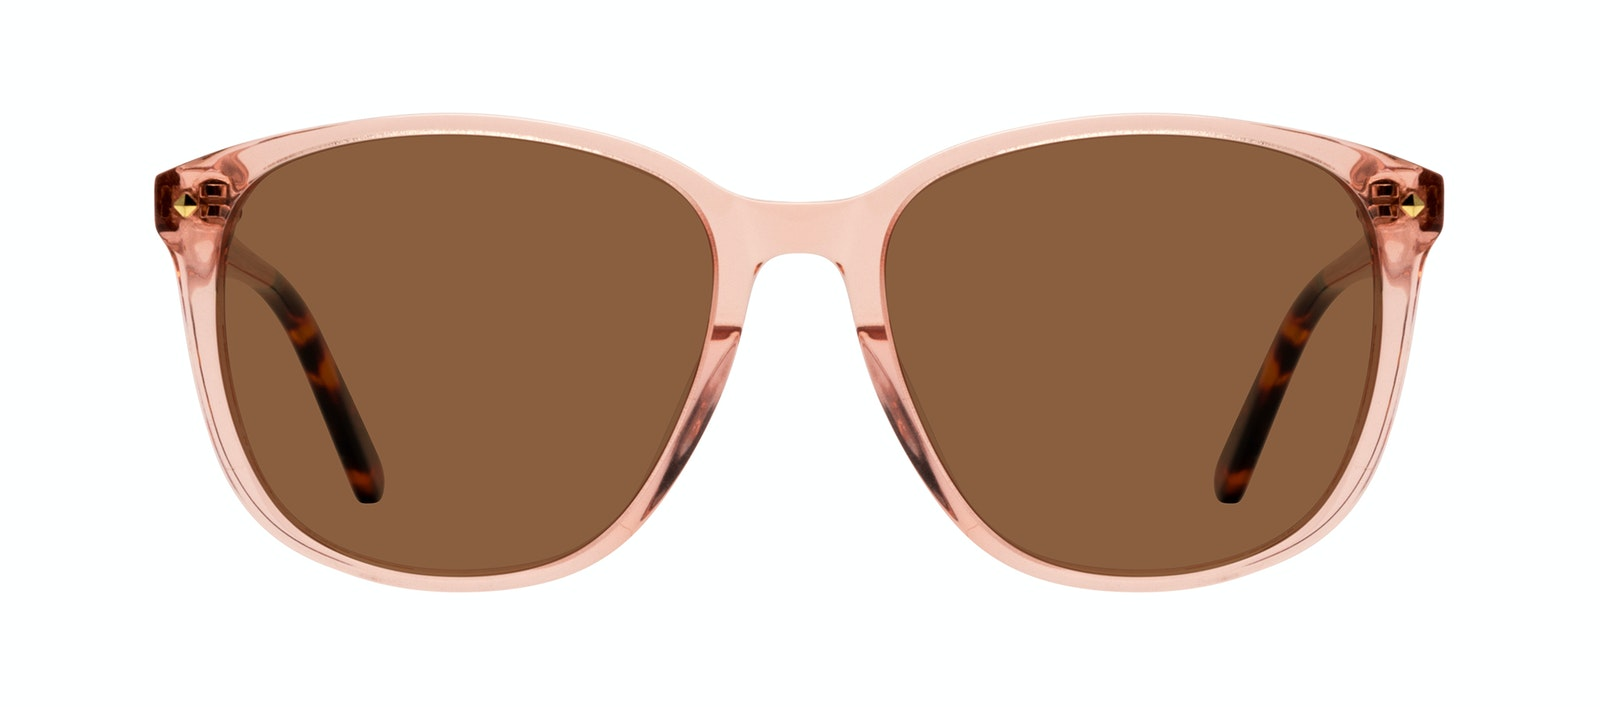 Affordable Fashion Glasses Square Sunglasses Women Lauren Peach Front